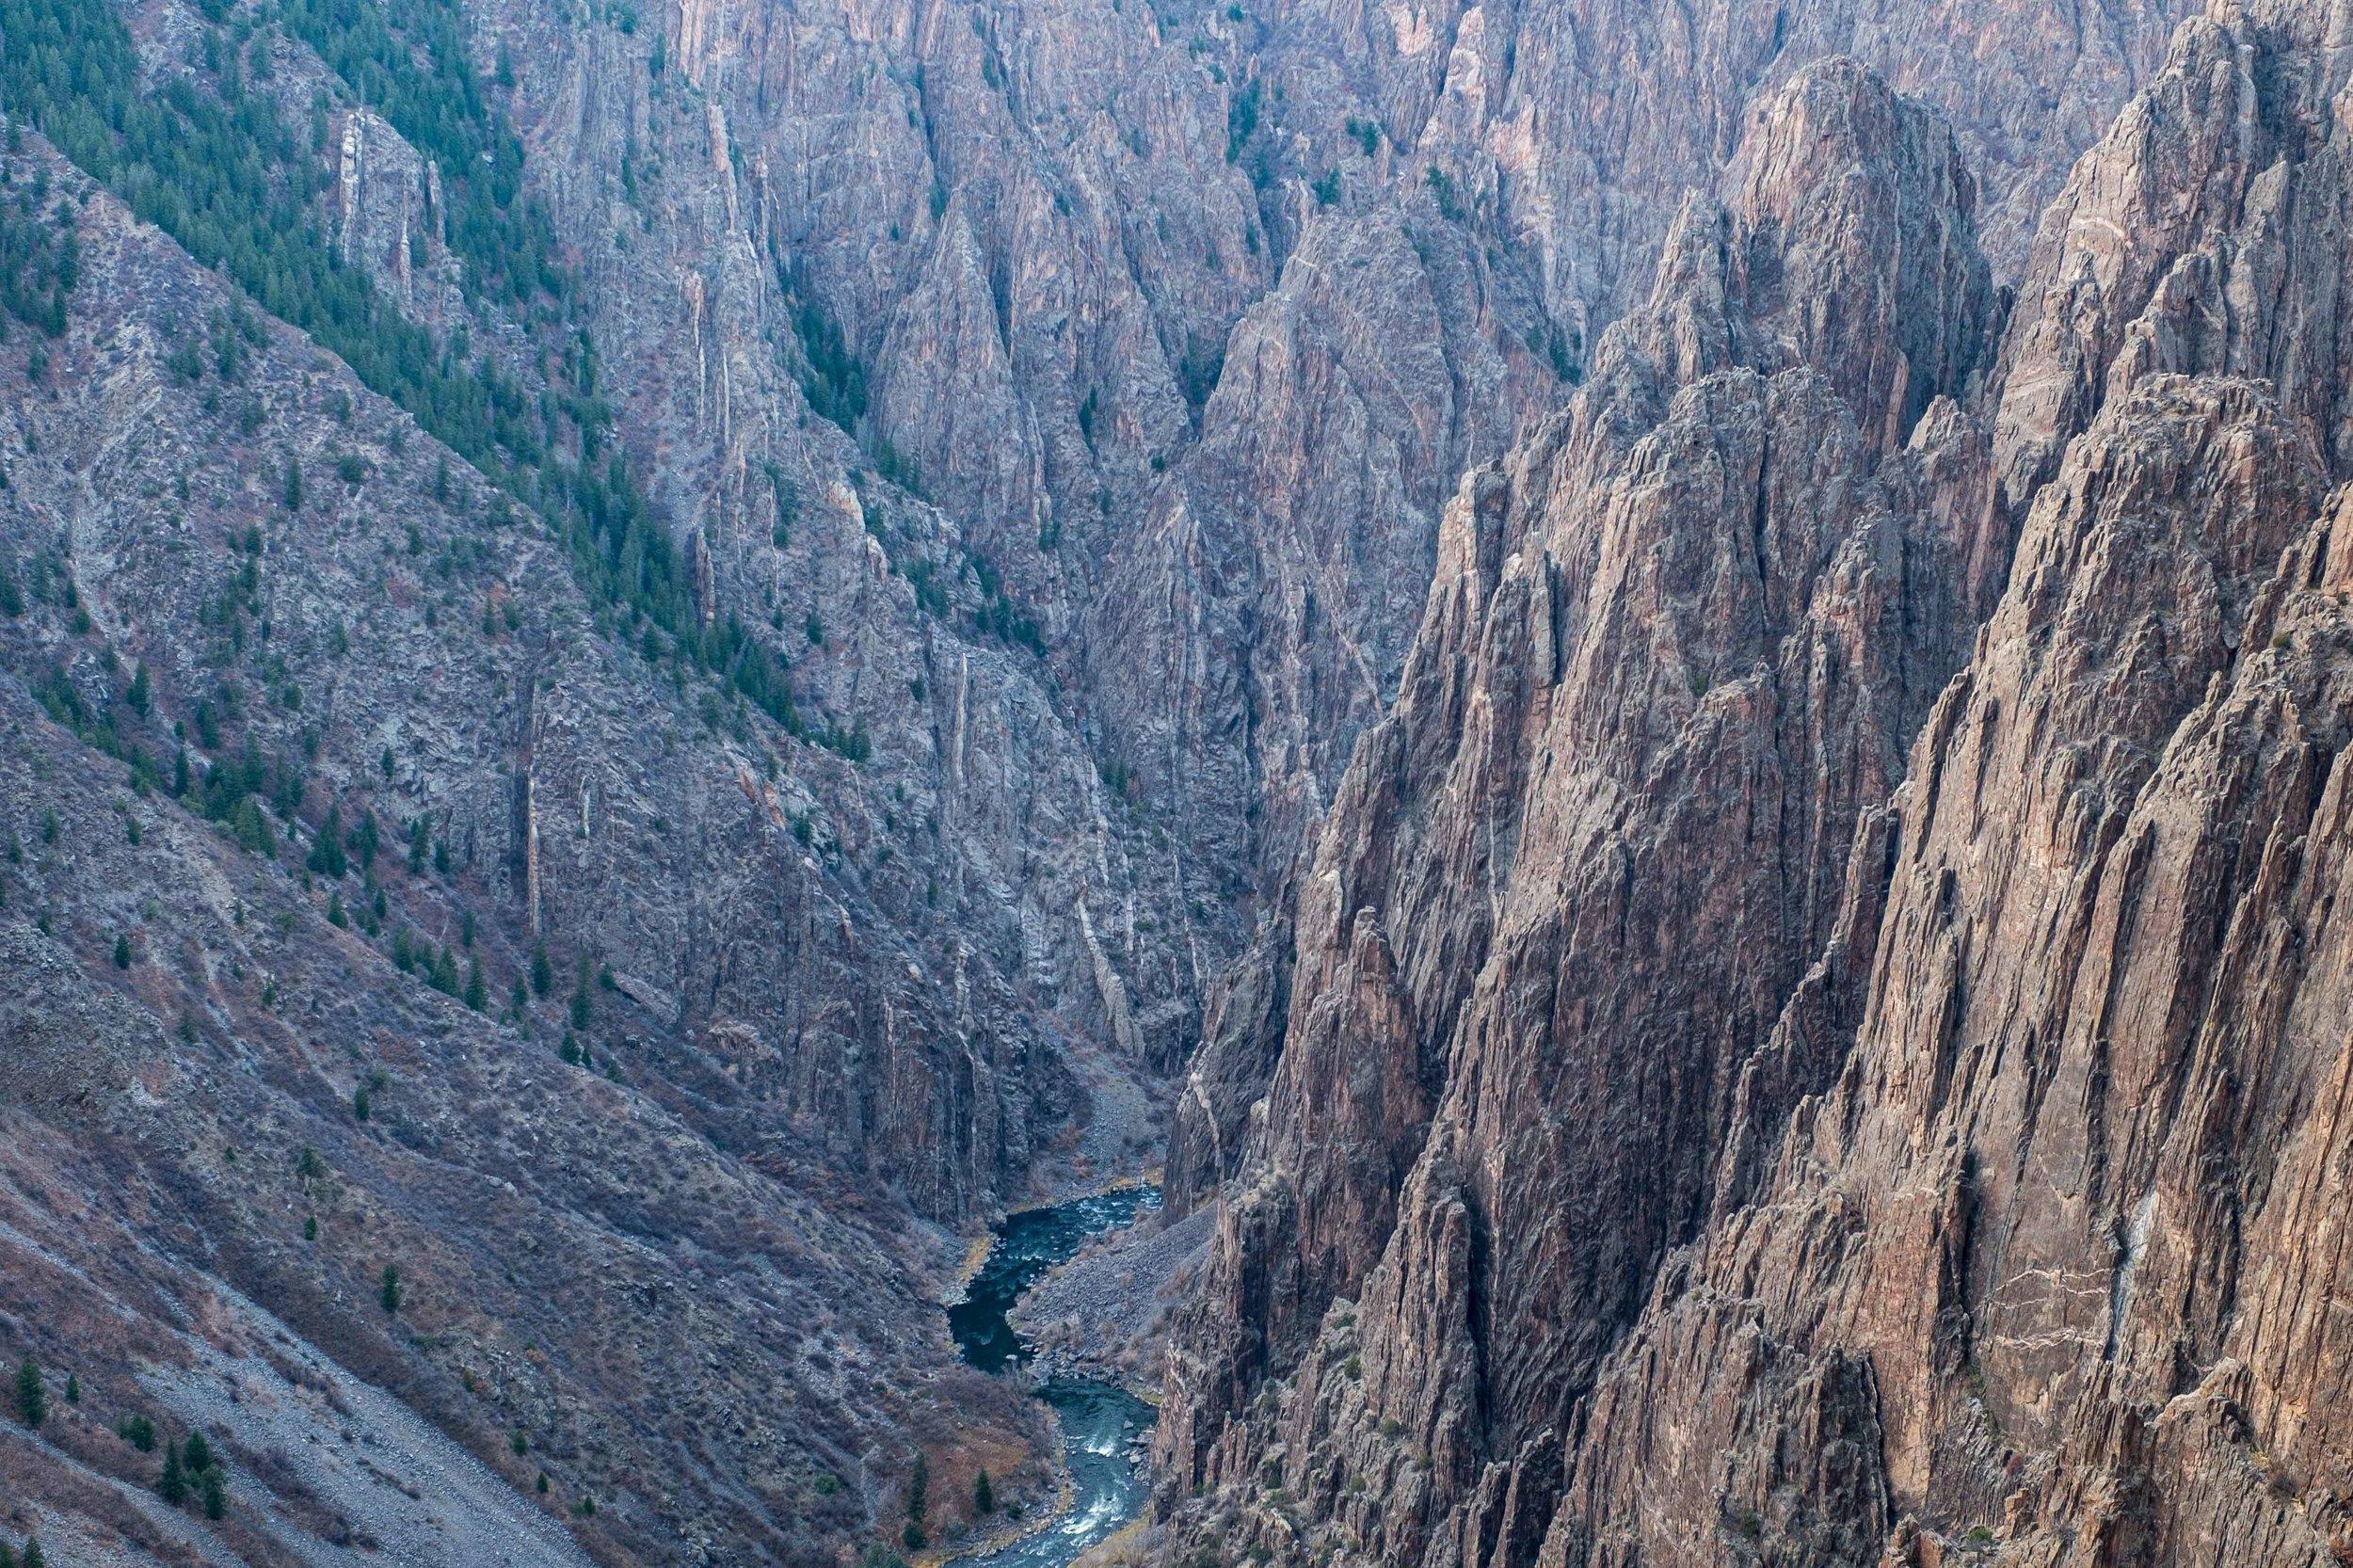 Black Canyon of the Gunnison National Park - 043.jpg